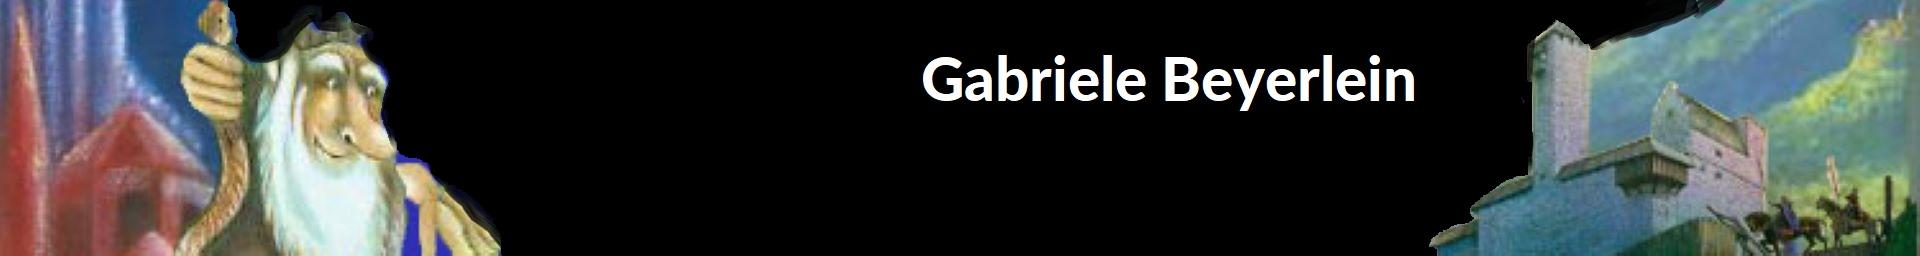 Gabriele Beyerlein